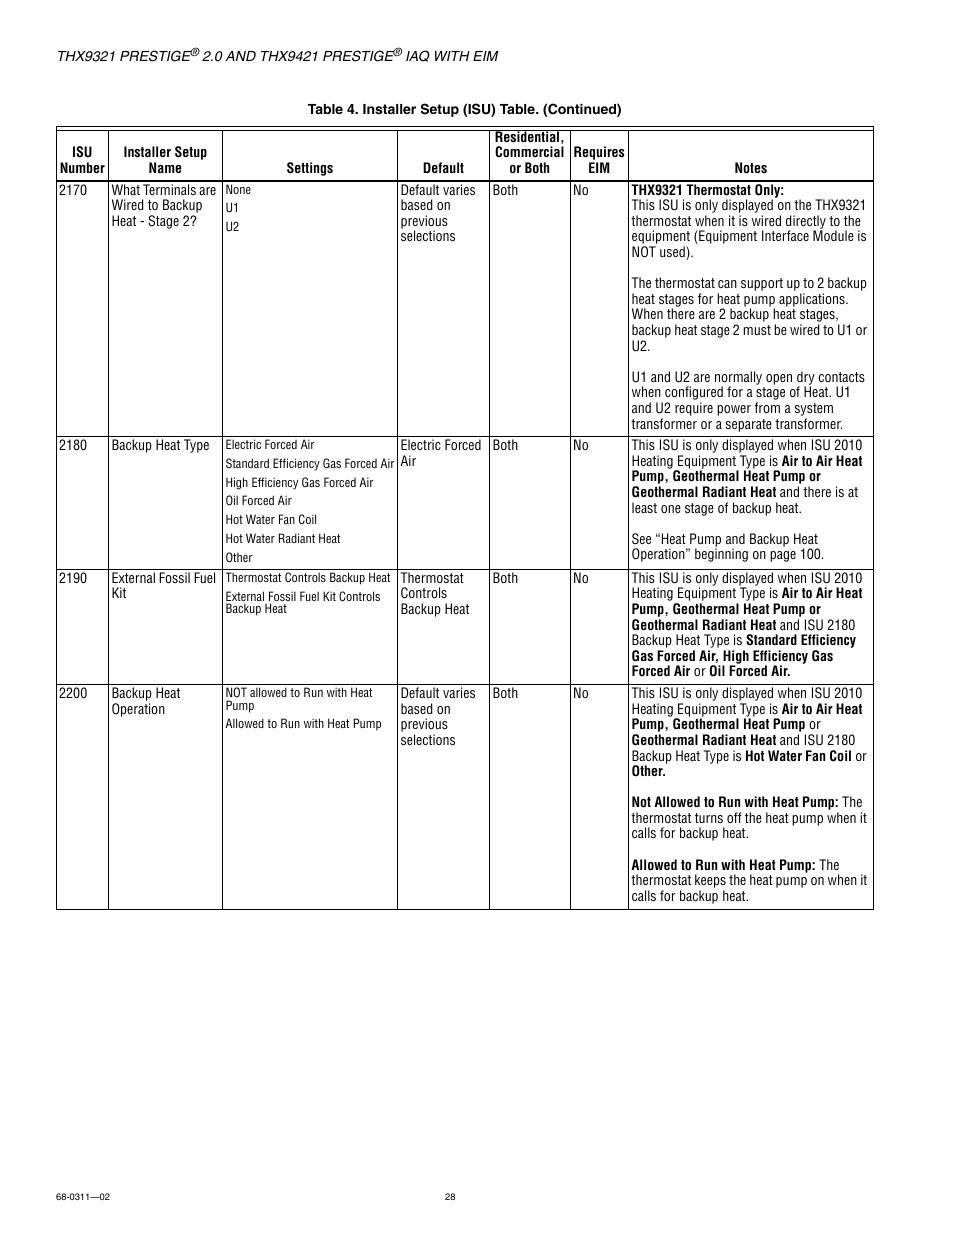 Honeywell Prestige Thx9321 User Manual Page 28 160